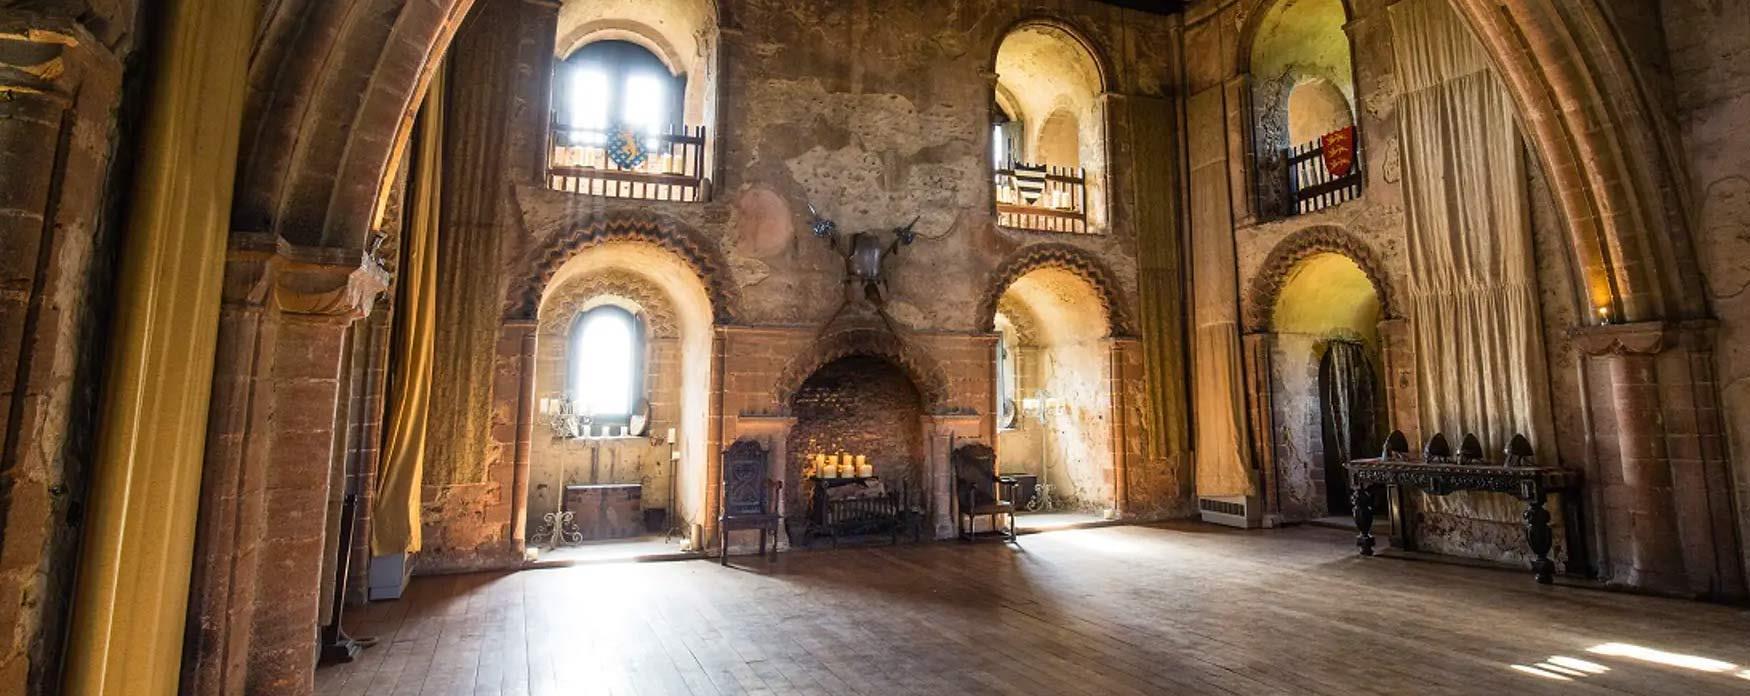 Experience historic Hedingham Castle